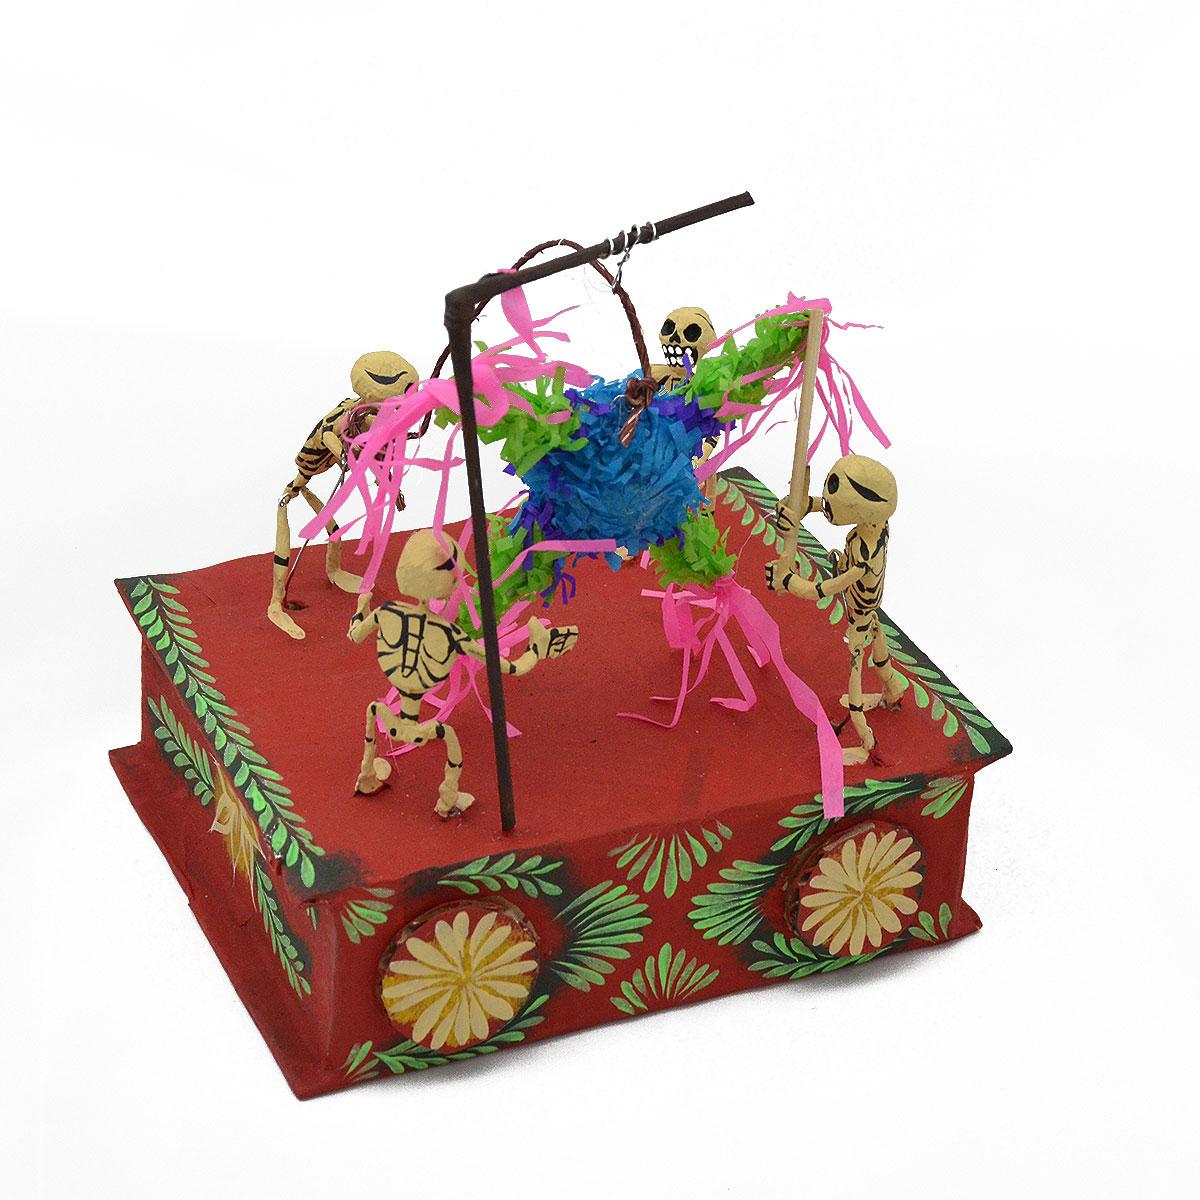 Cartoneria (Mexican Paper Mache) Josue Eleazar Castro: Large Piñata cartoneria